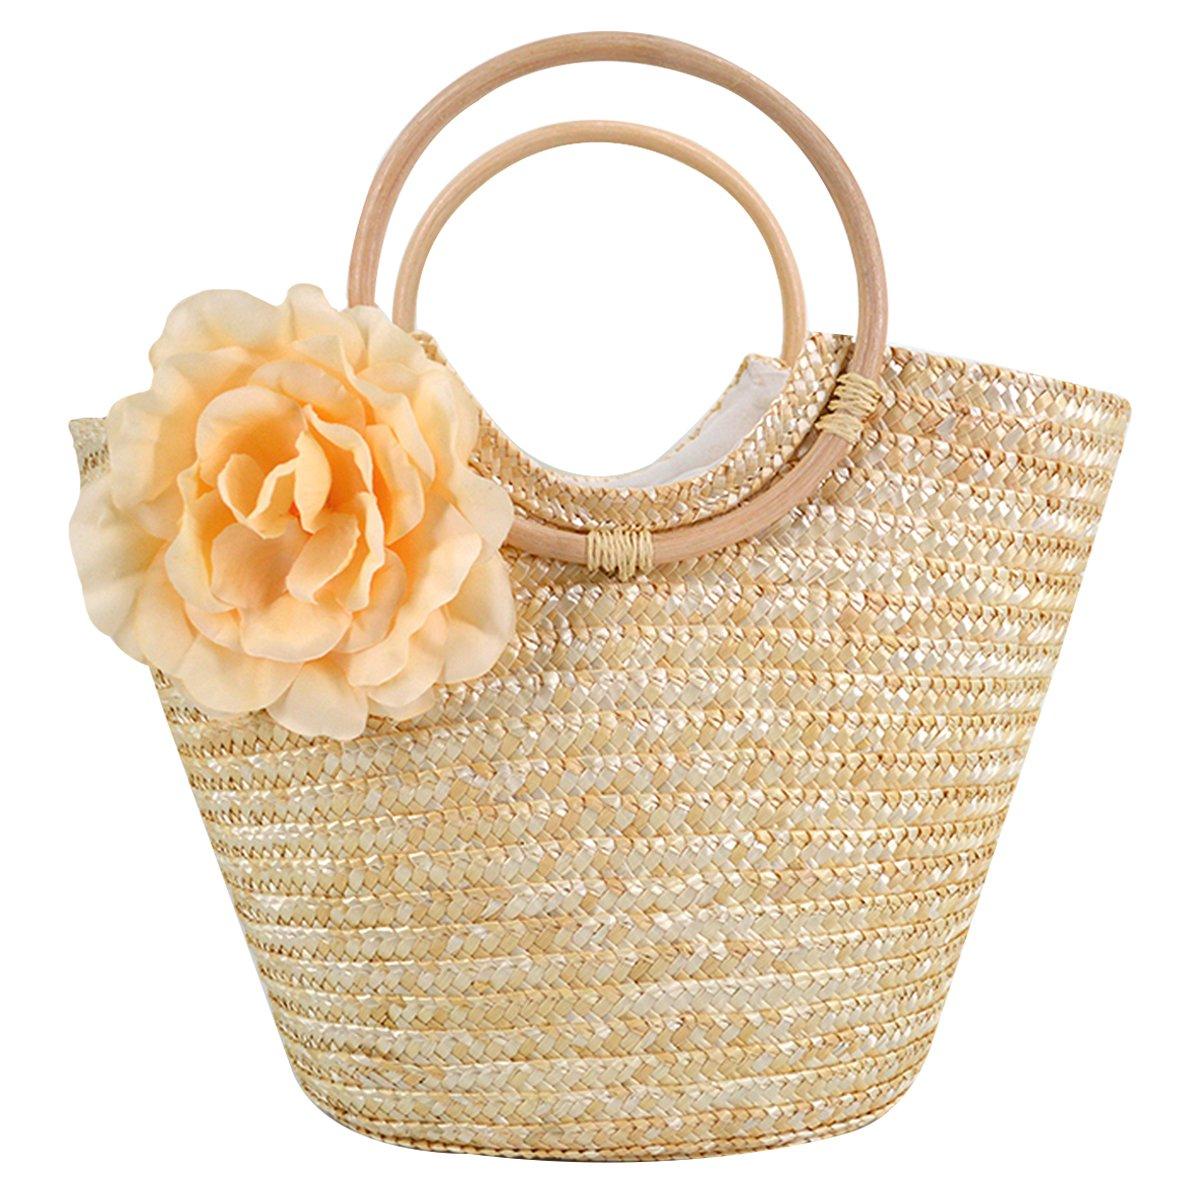 Monique Women Rose Flower Handbag Oversize Straw Knitted Tote Two Ring Top Handle Bag Summer Beach Clutch Beige